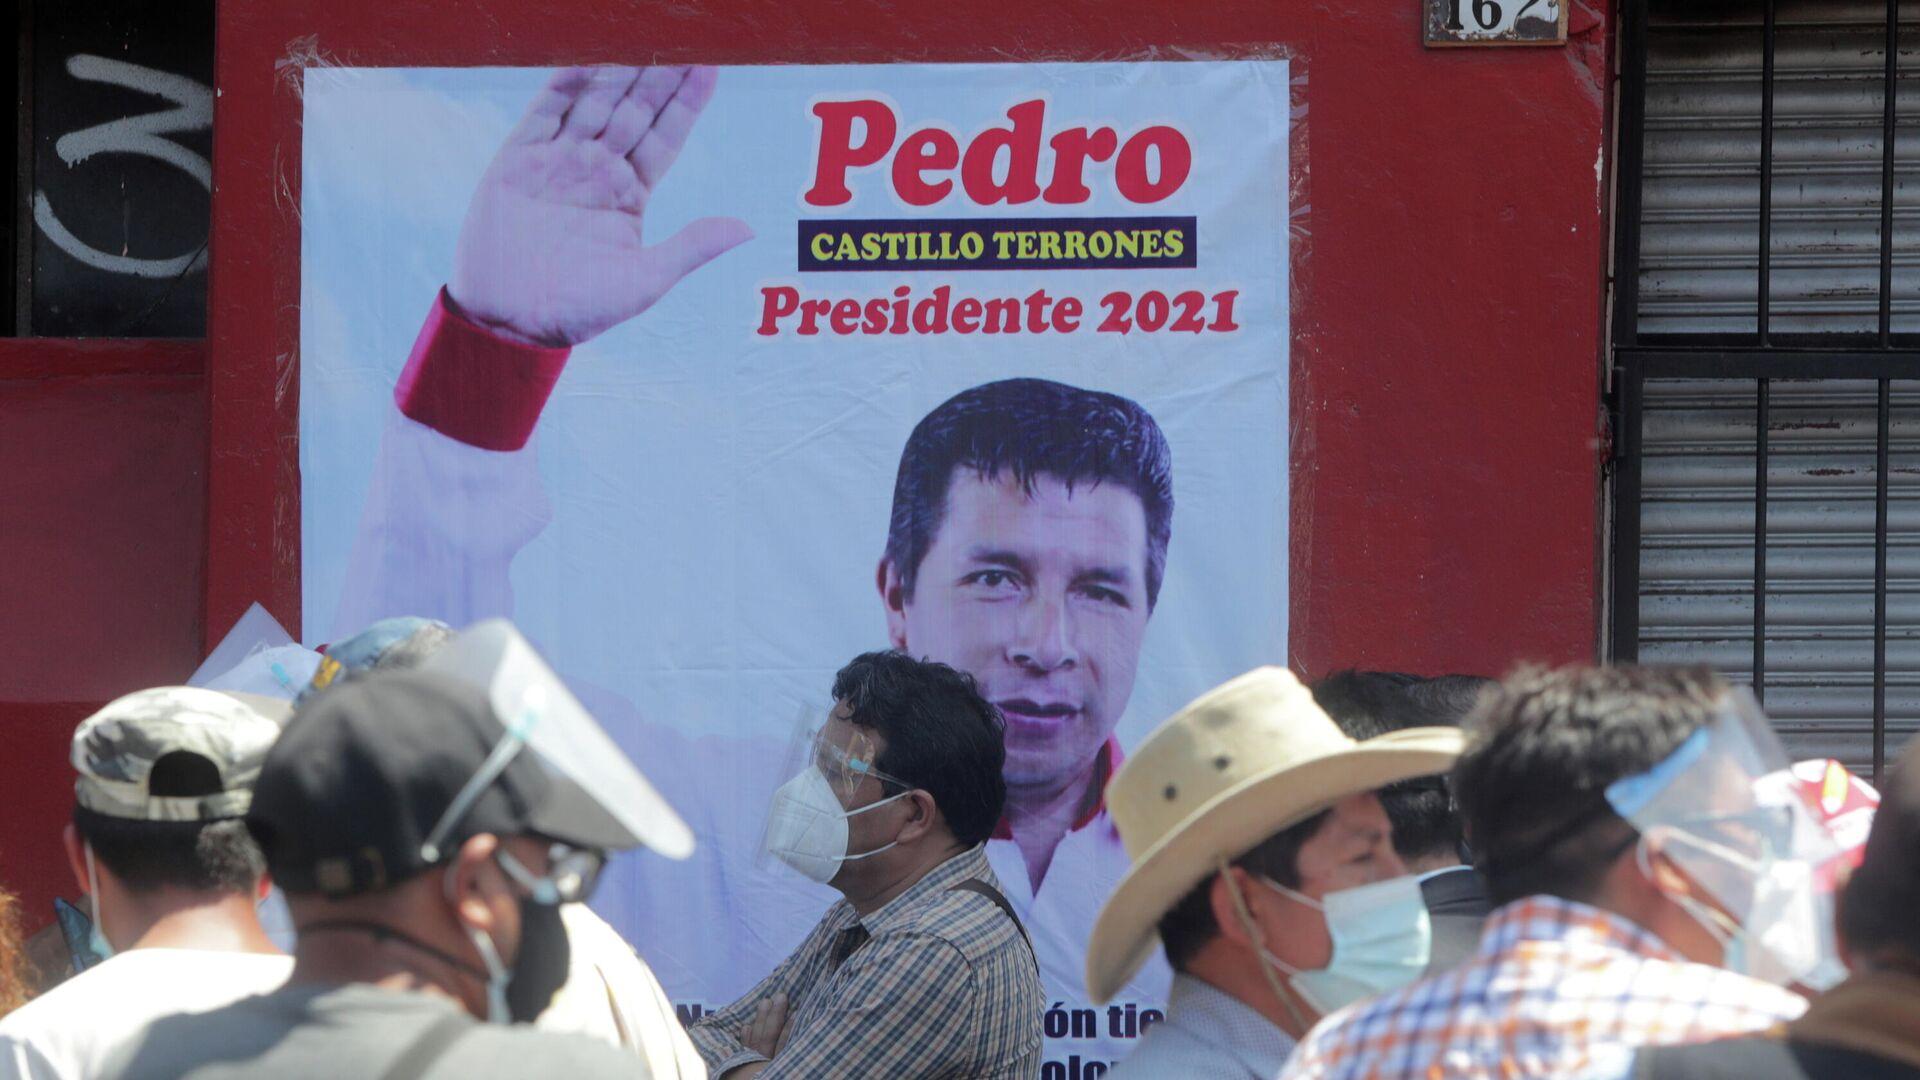 Pancarta de Pedro Castillo, candidato a la presidencia de Perú - Sputnik Mundo, 1920, 21.04.2021